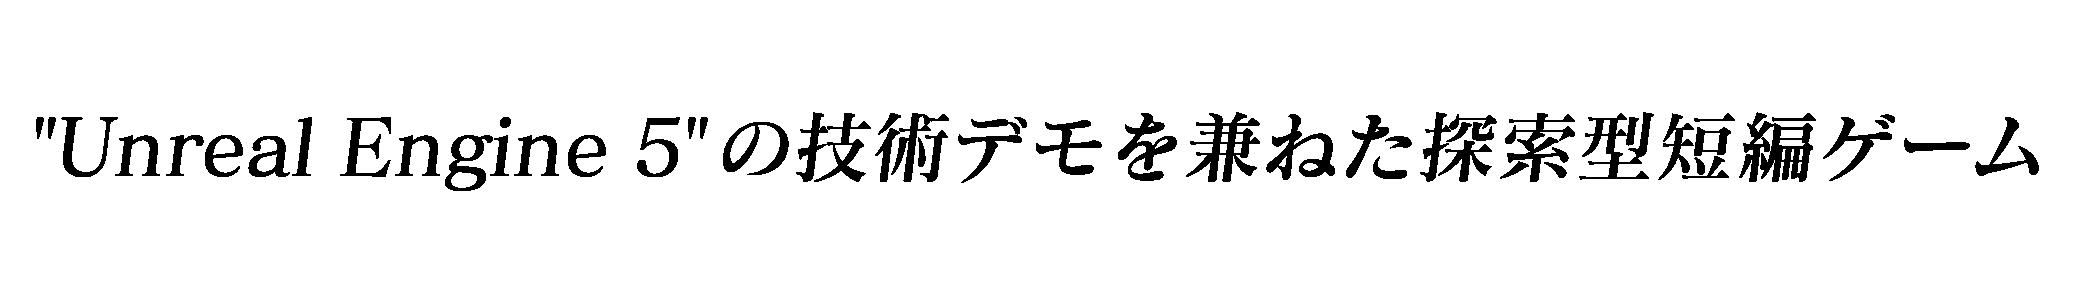 Unreal Engine 5 の技術デモを兼ねた探索型短編ゲーム